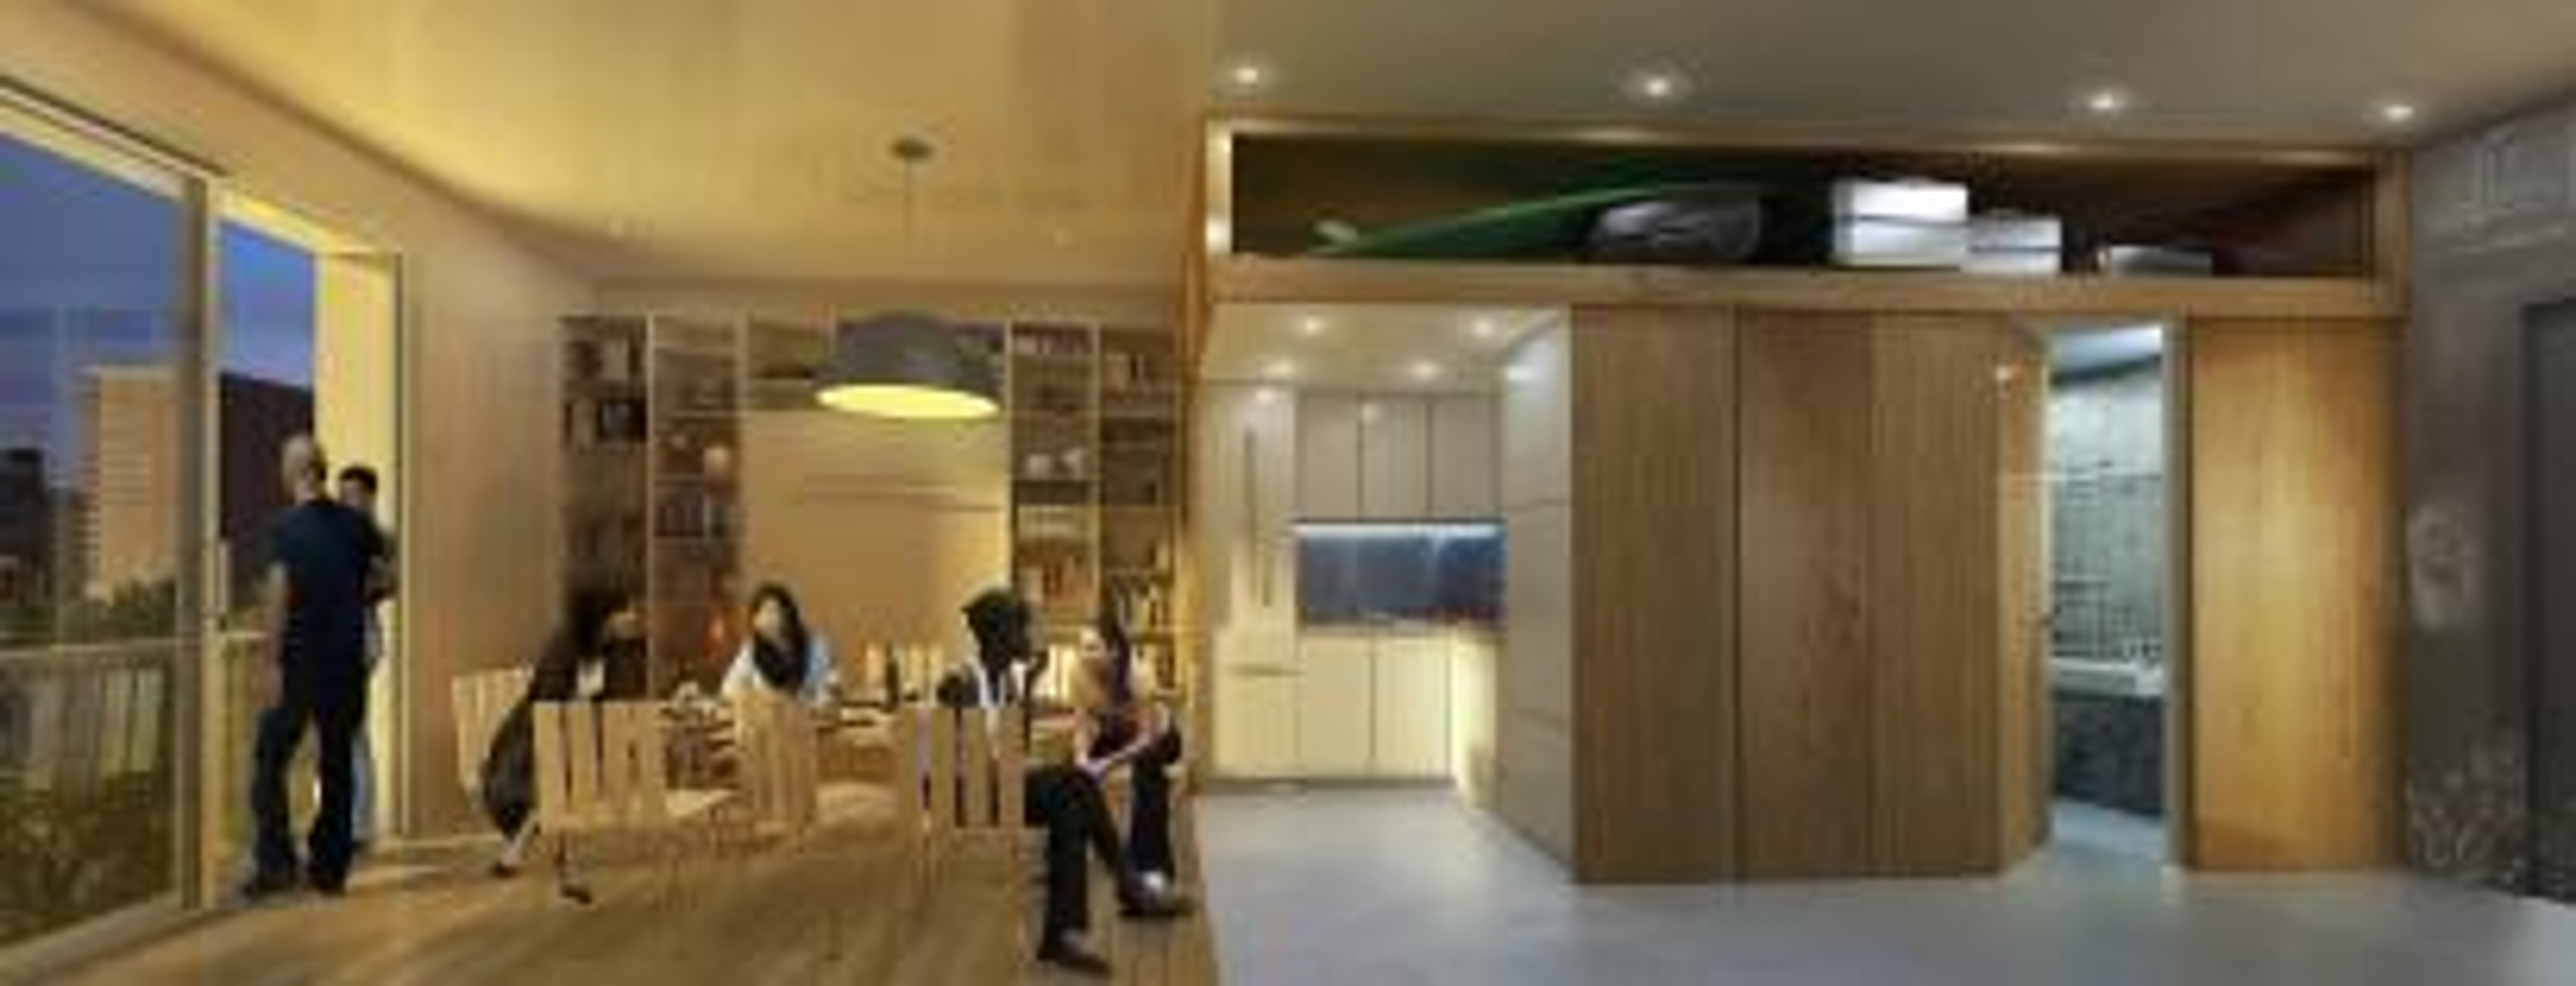 NYC micro-apartment